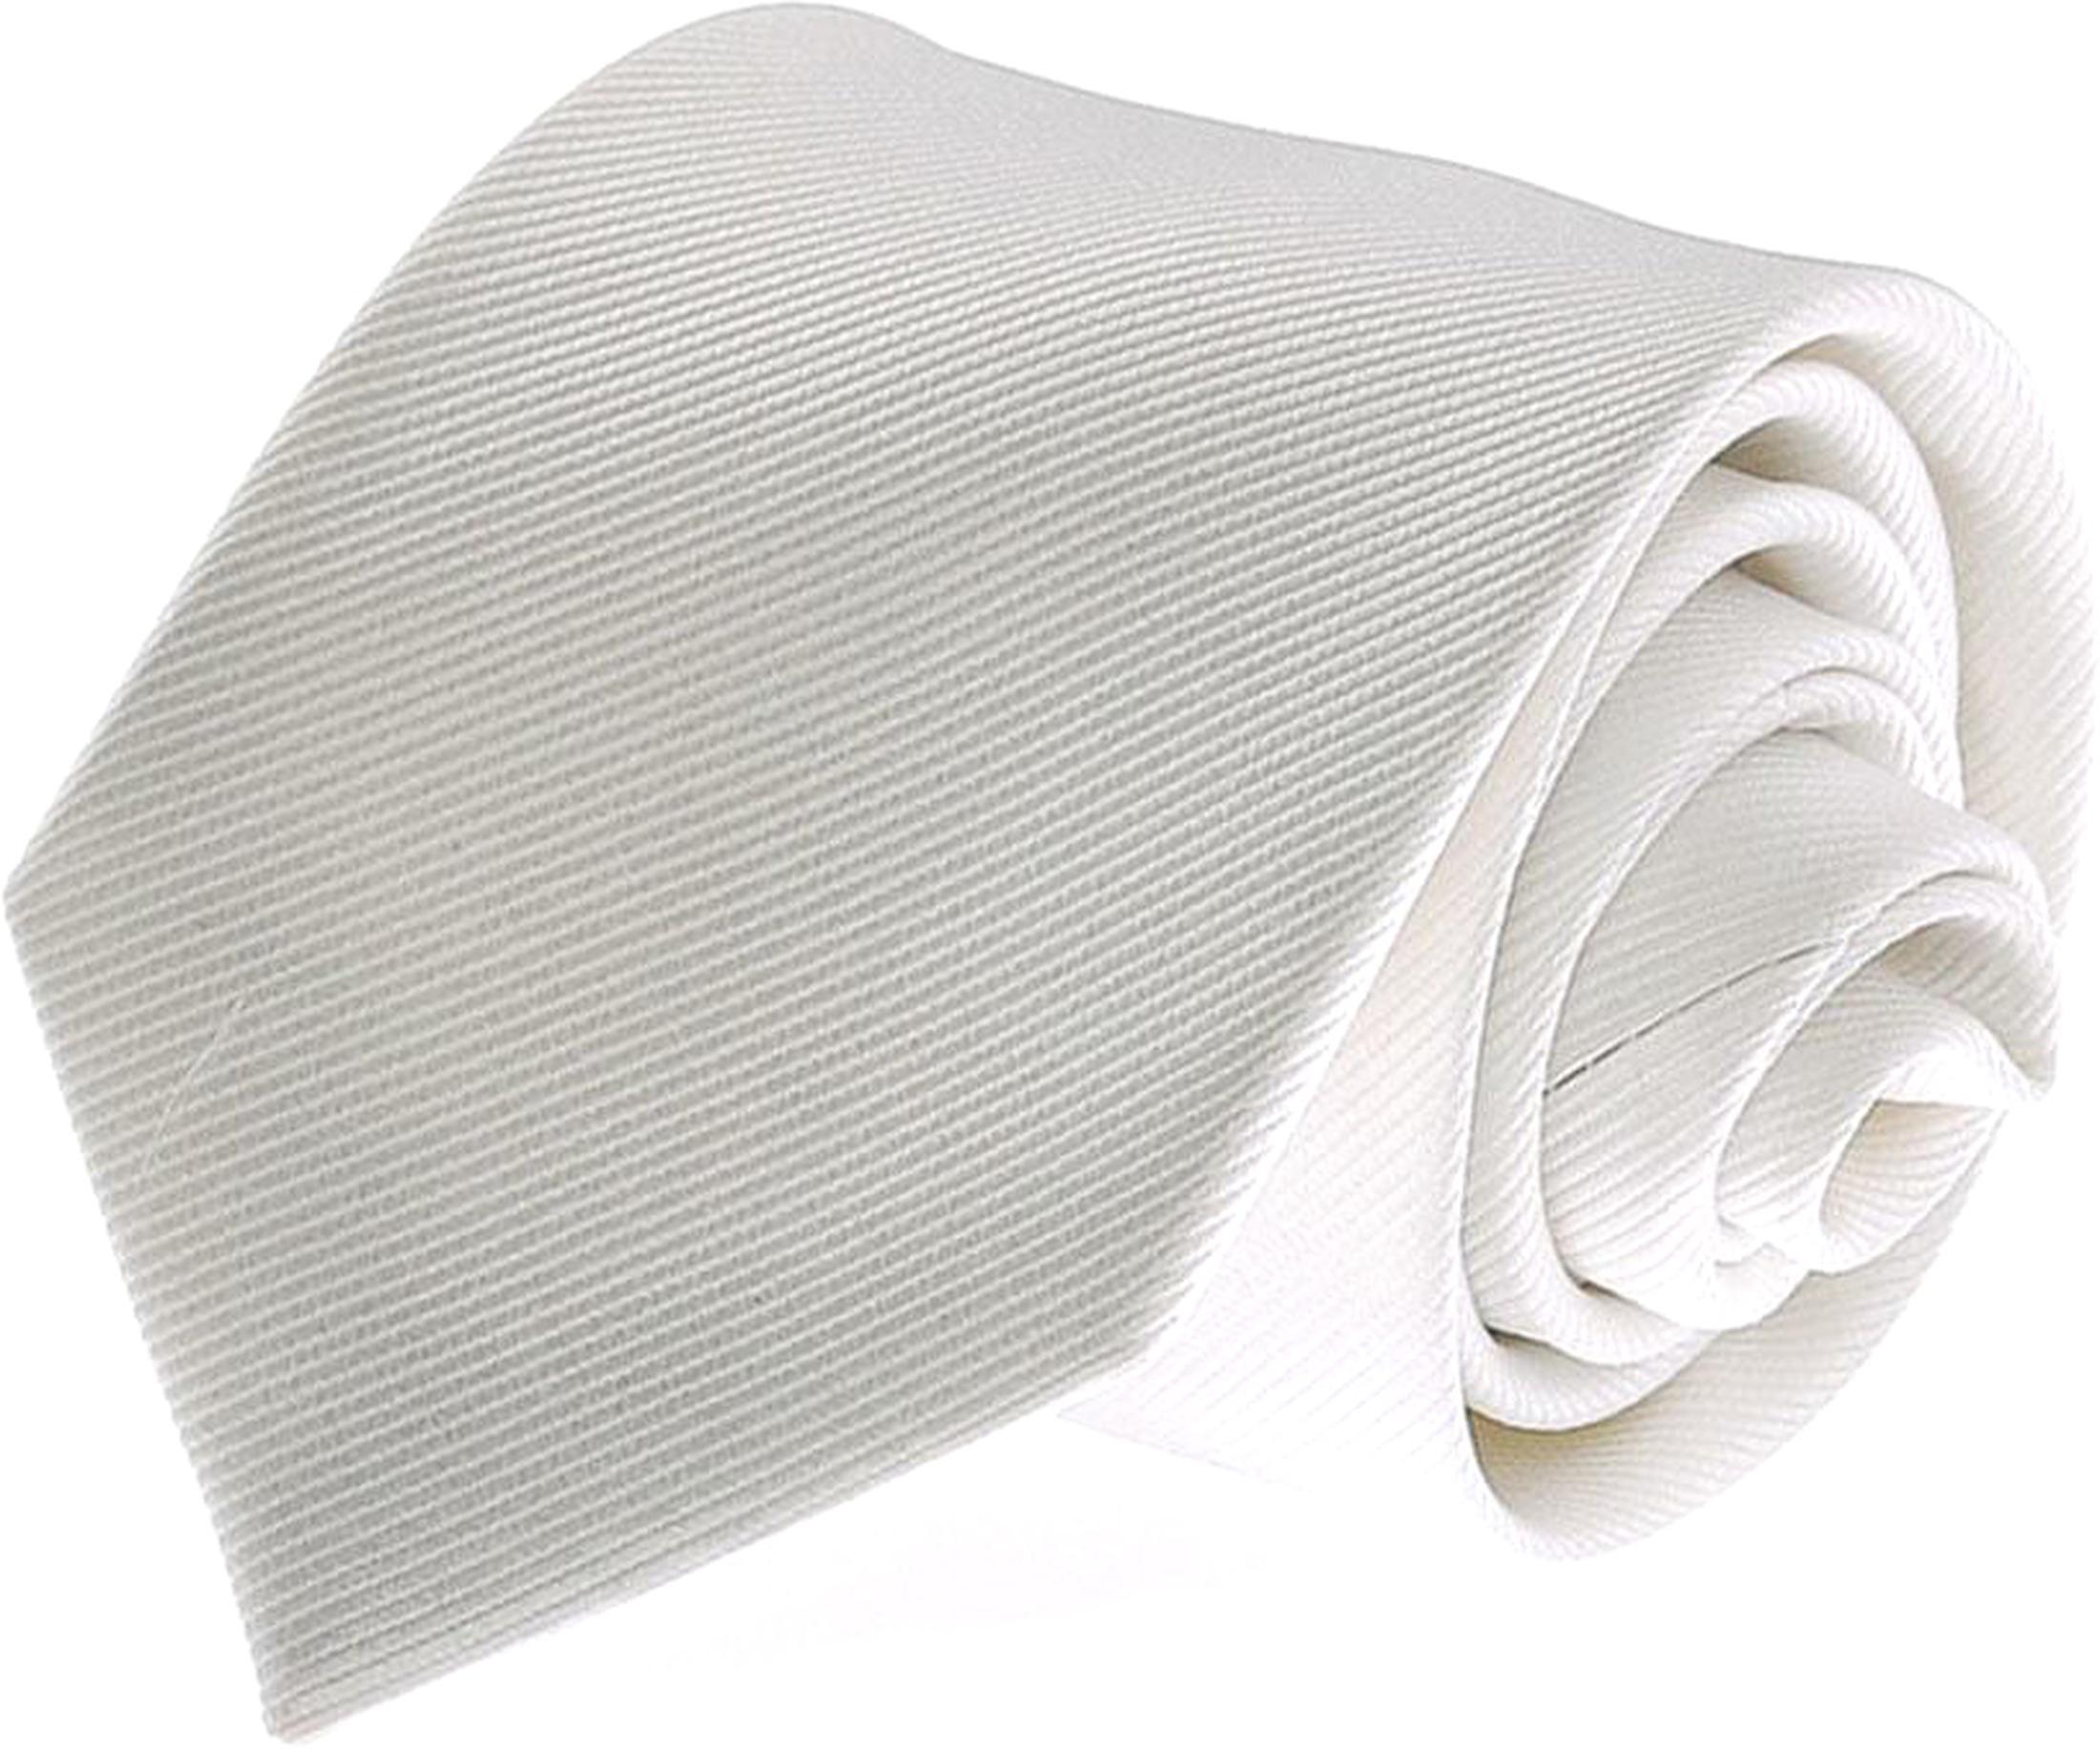 Silk Tie White F27 foto 0